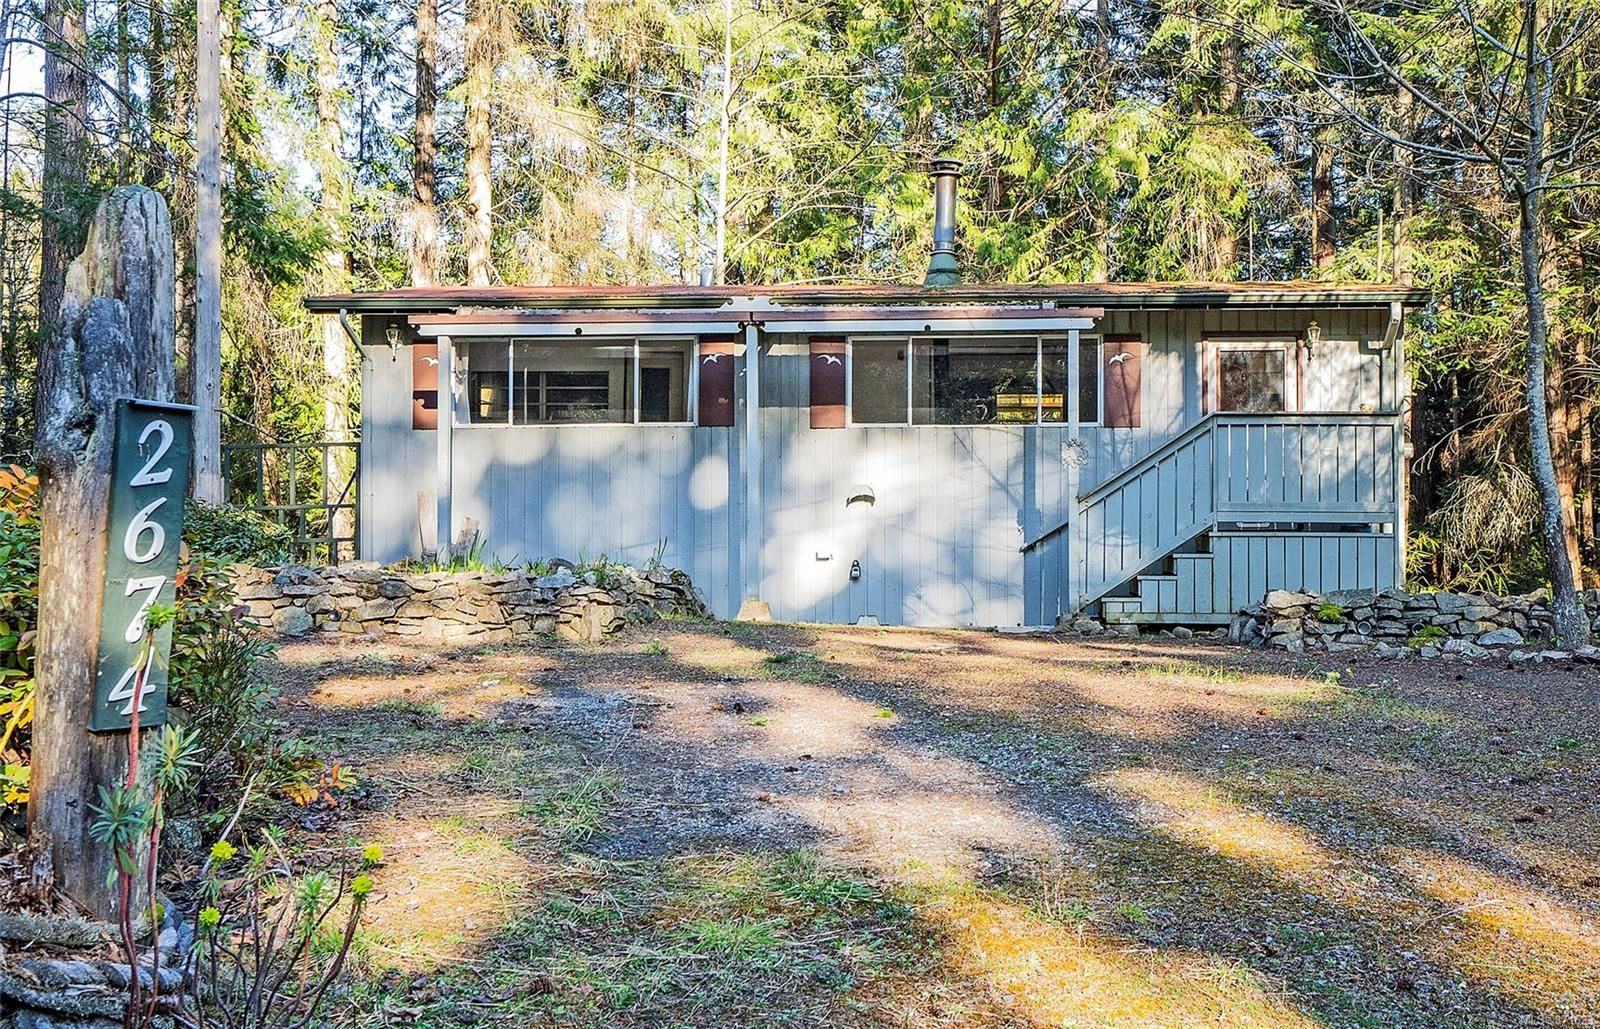 Main Photo: 2674 Galleon Way in : GI Pender Island House for sale (Gulf Islands)  : MLS®# 871623